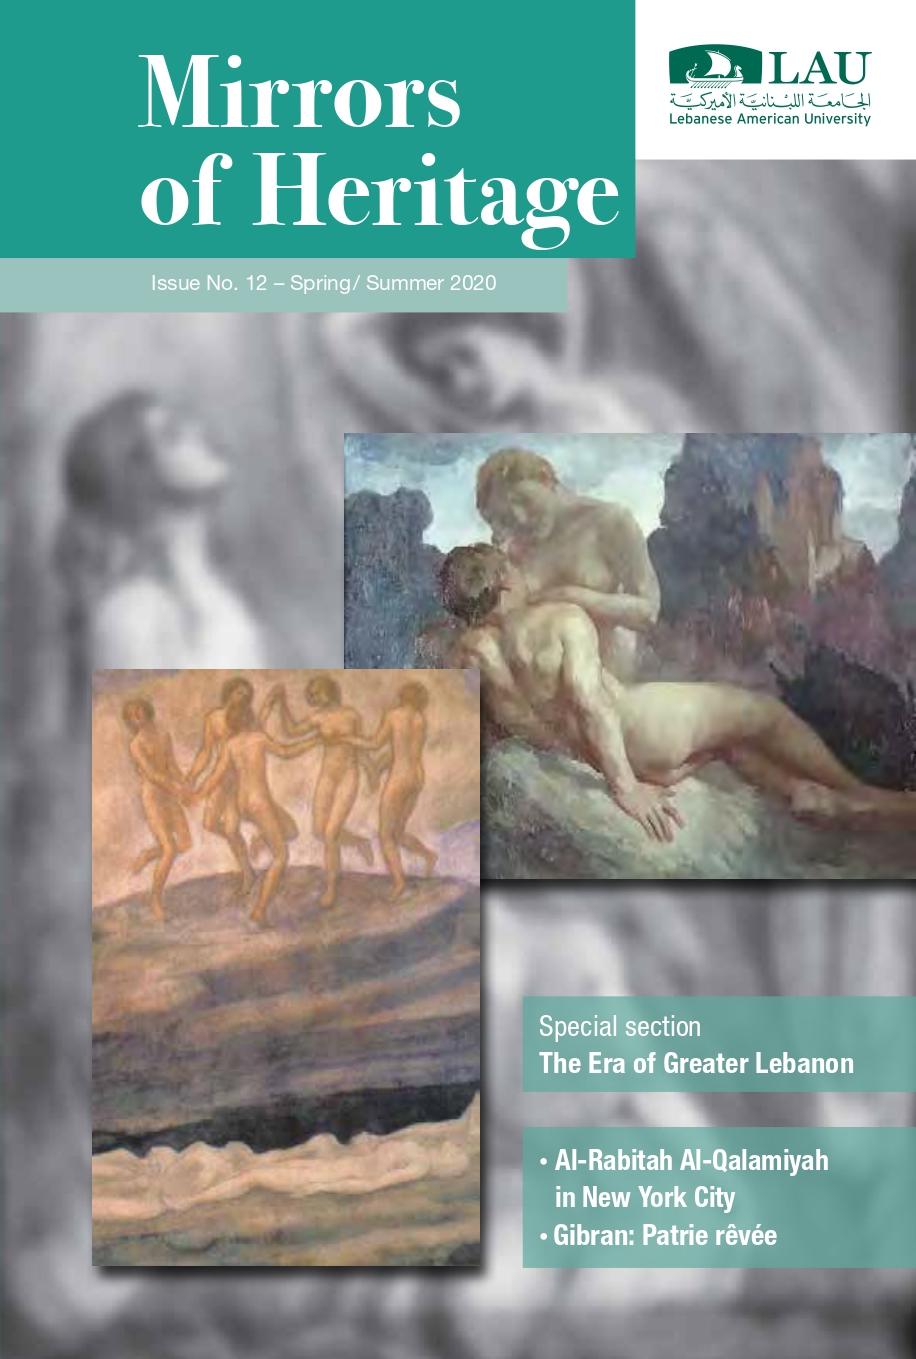 Mirrors of Heritage, Lebanese American University, No. 12 - Spring/Summer 2020.